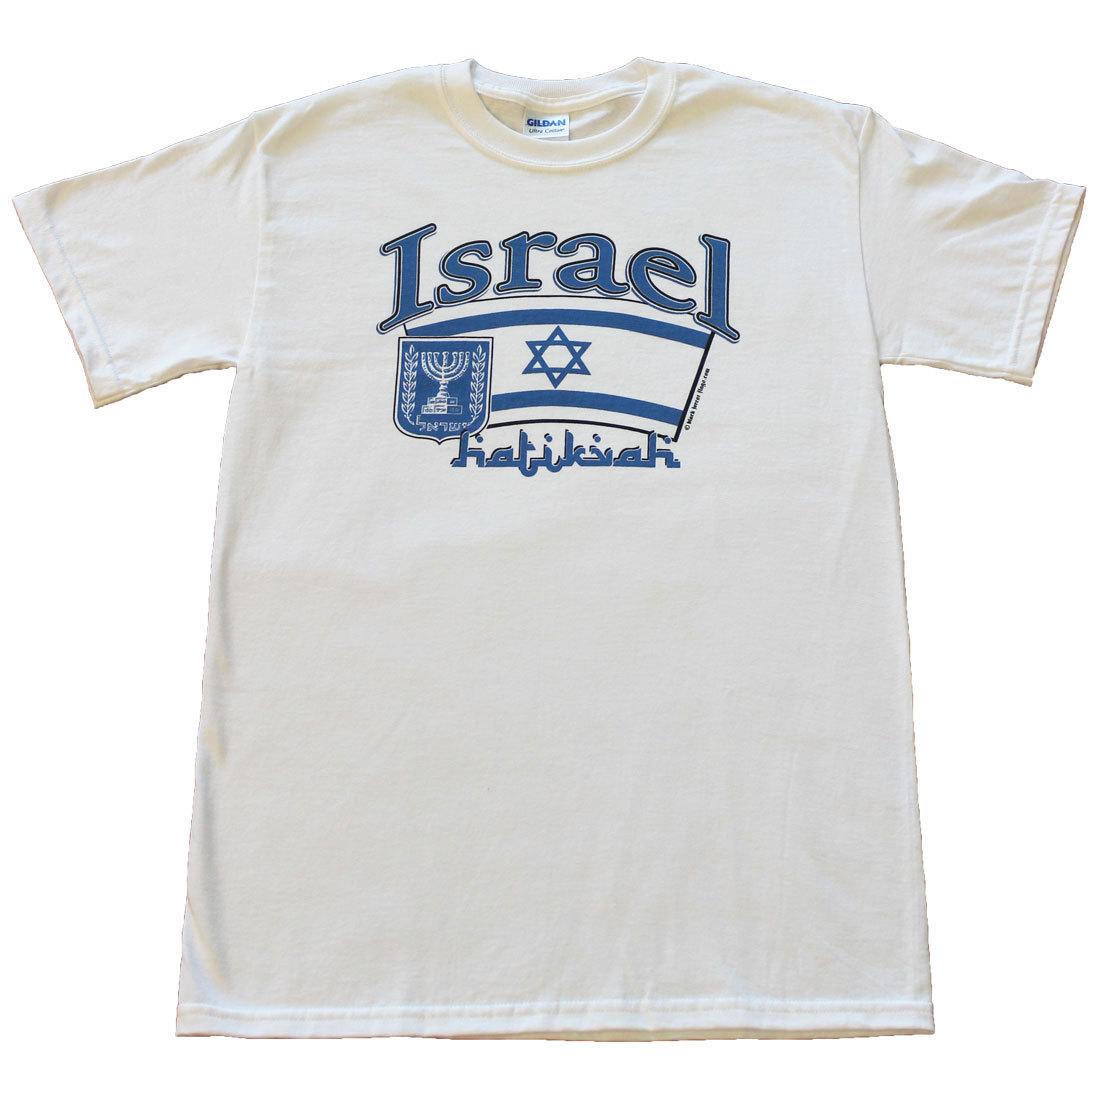 Israel2 2